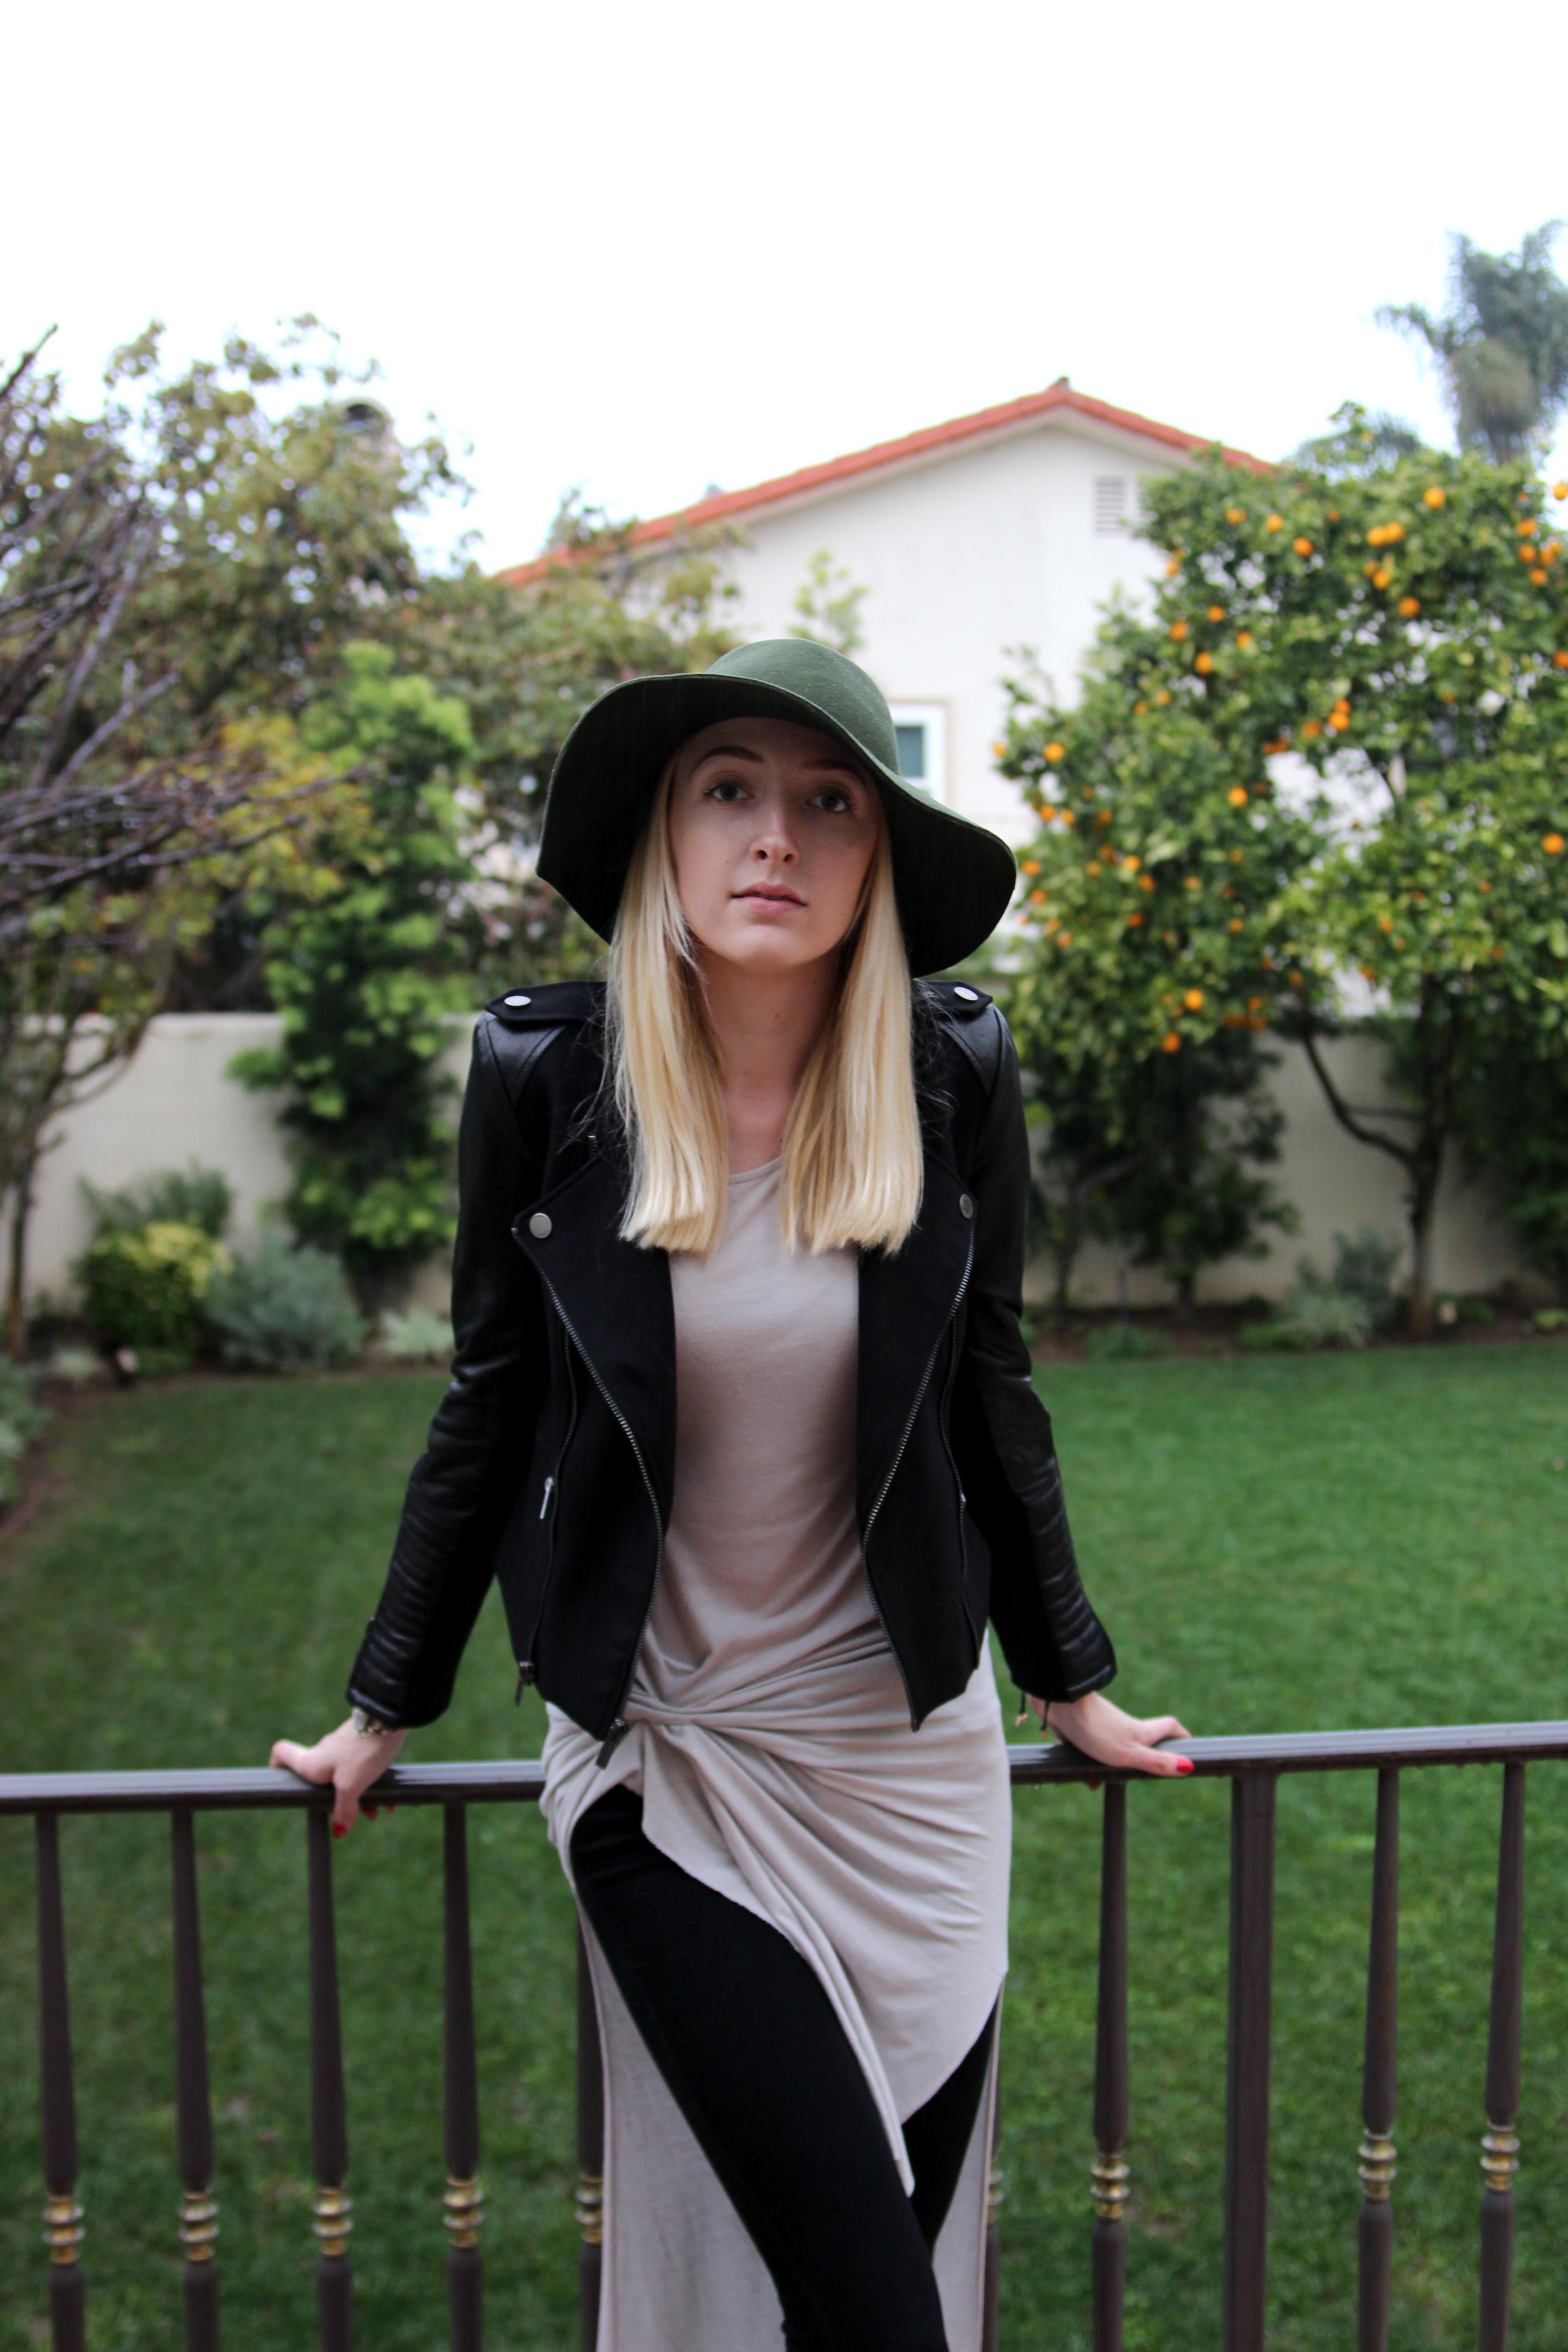 Jacket BCBG Max Azria  // Dress  AllSaints // Jeans  J. Brand  // Hat  Anthropologie